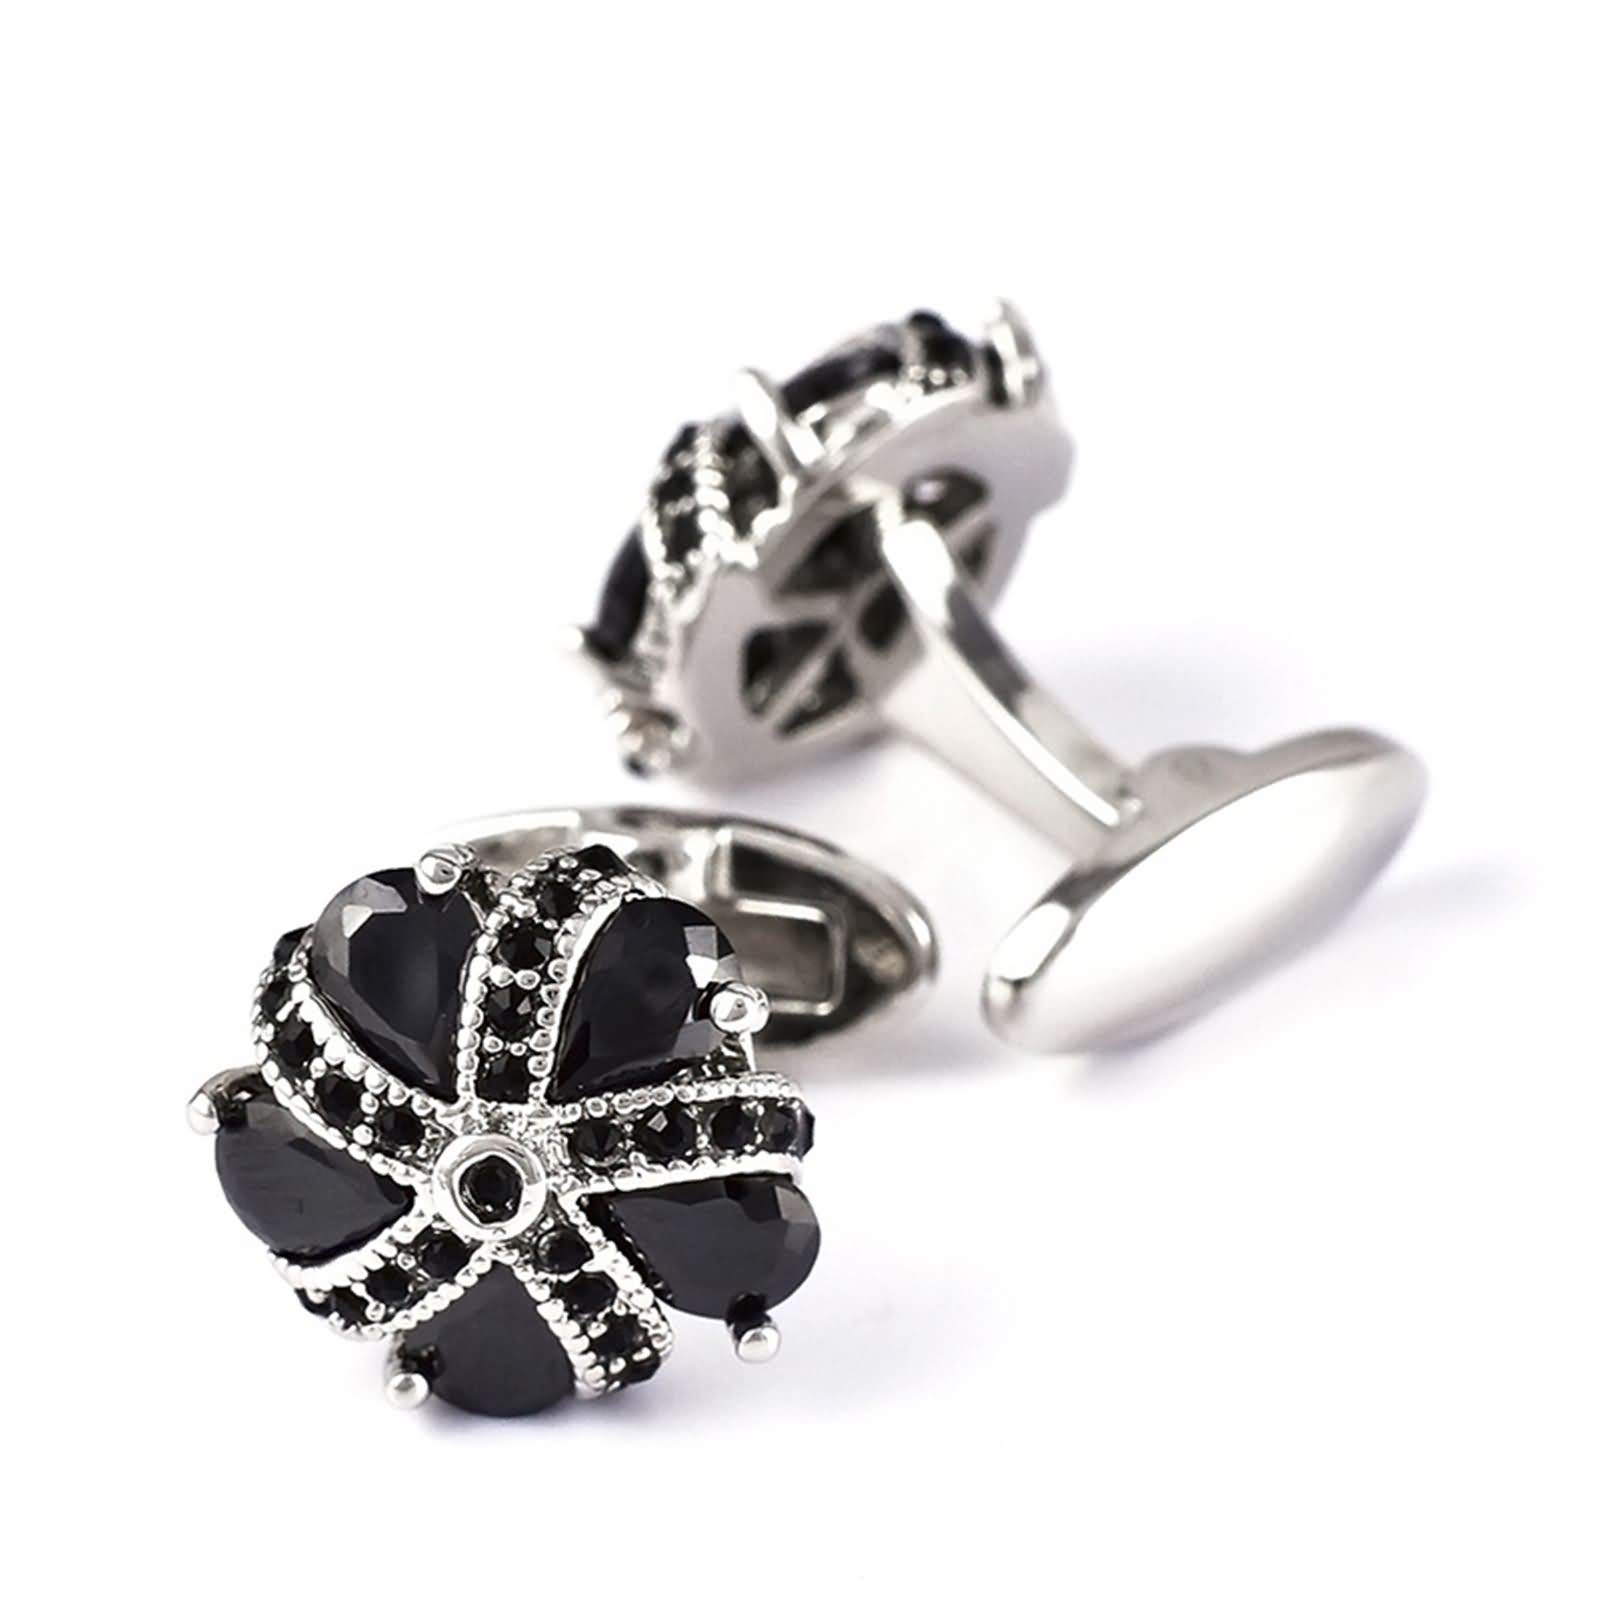 Daesar Cuff Links Copper Cuff Links Vintage Water Drop Flower Crystal Cubic Zirconia Black Cufflinks for Wedding Black